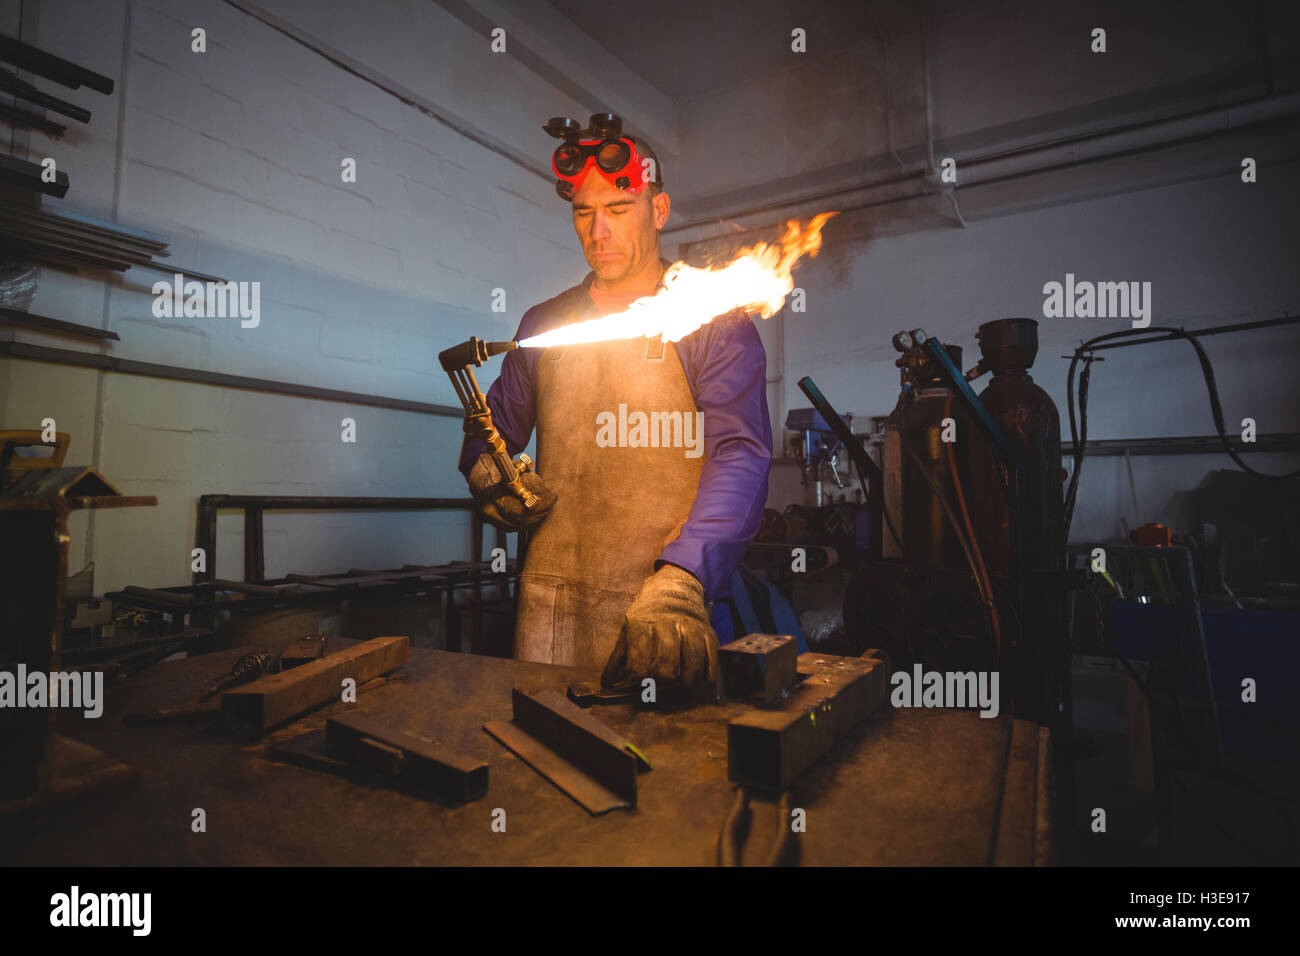 Male welder holding welding torch - Stock Image